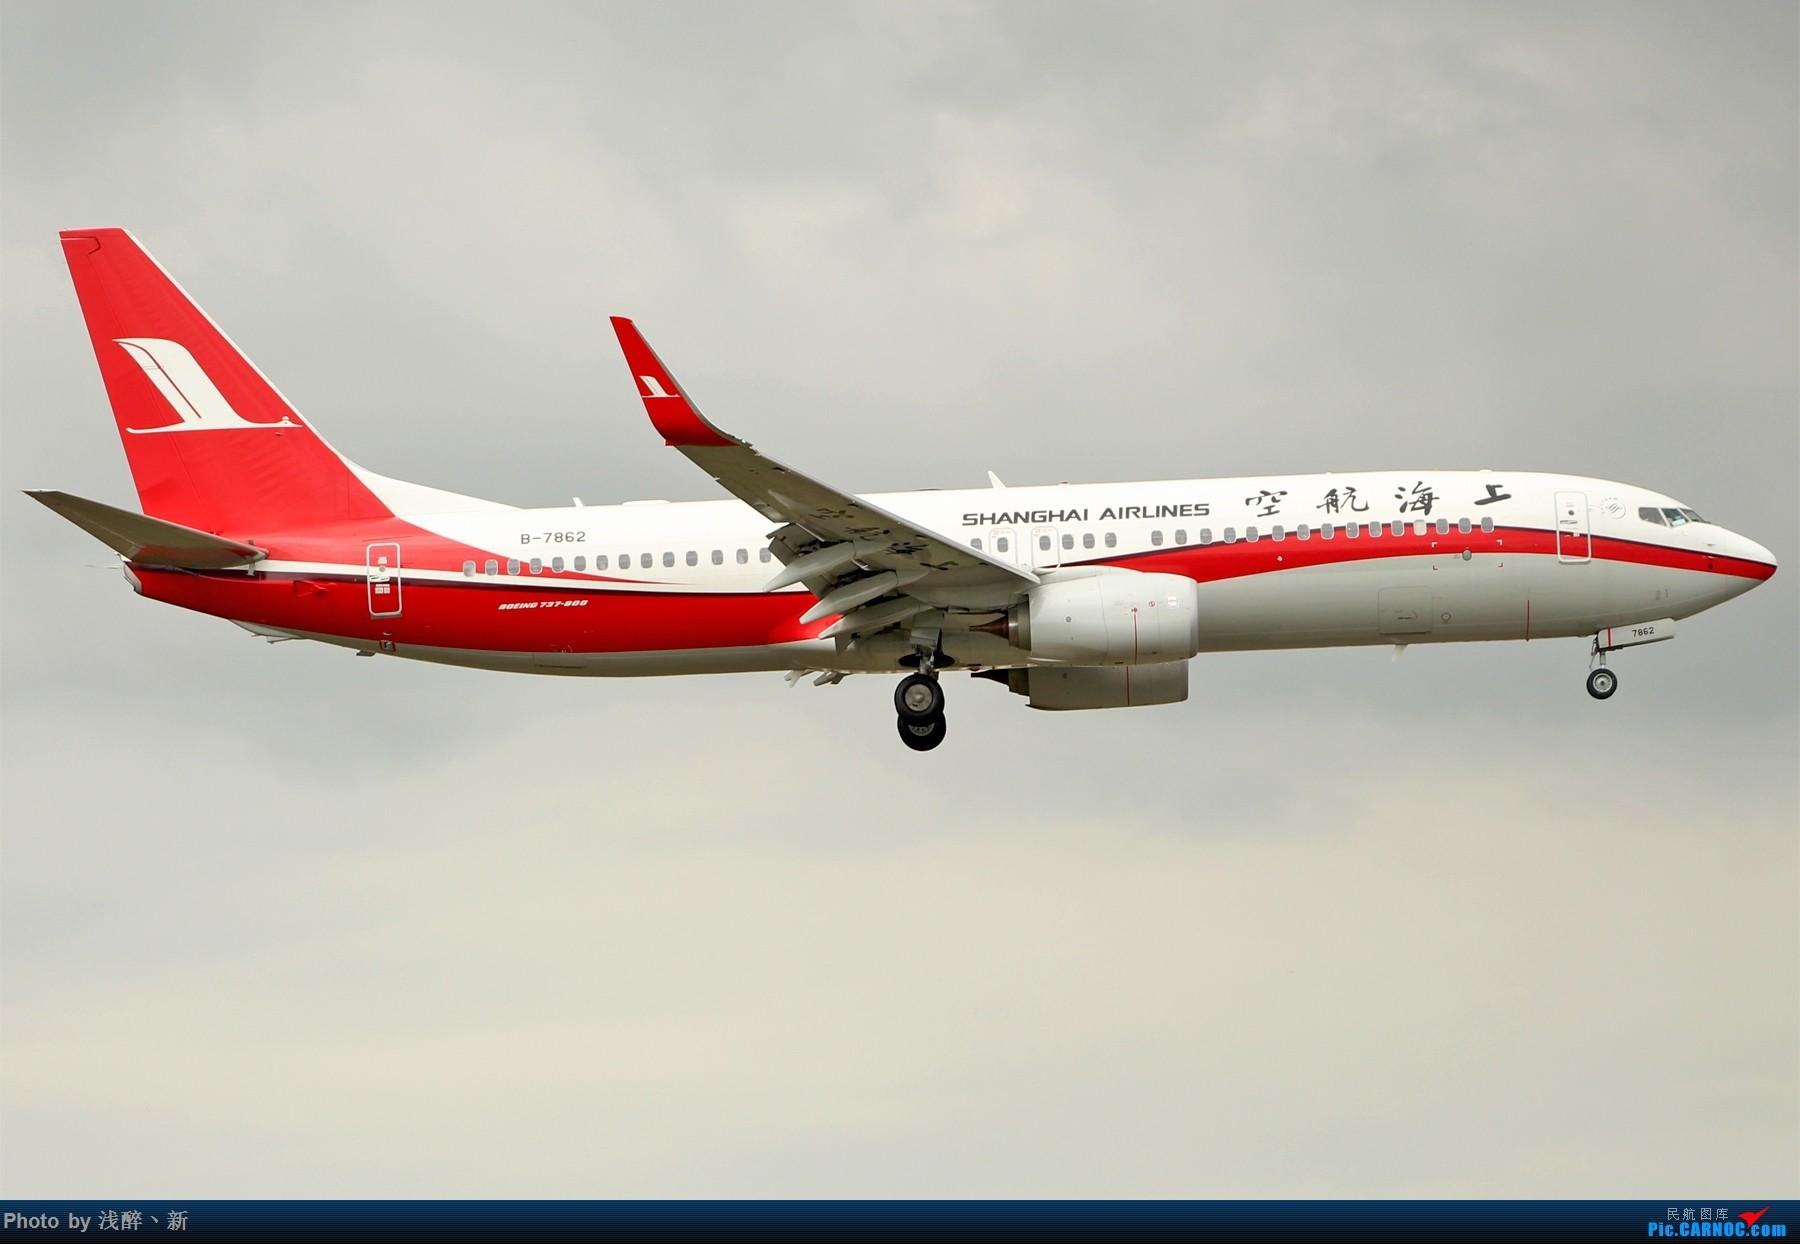 Re:[原创]DLC 7.16 机场游击战 BOEING 737-800 B-7862 中国大连国际机场